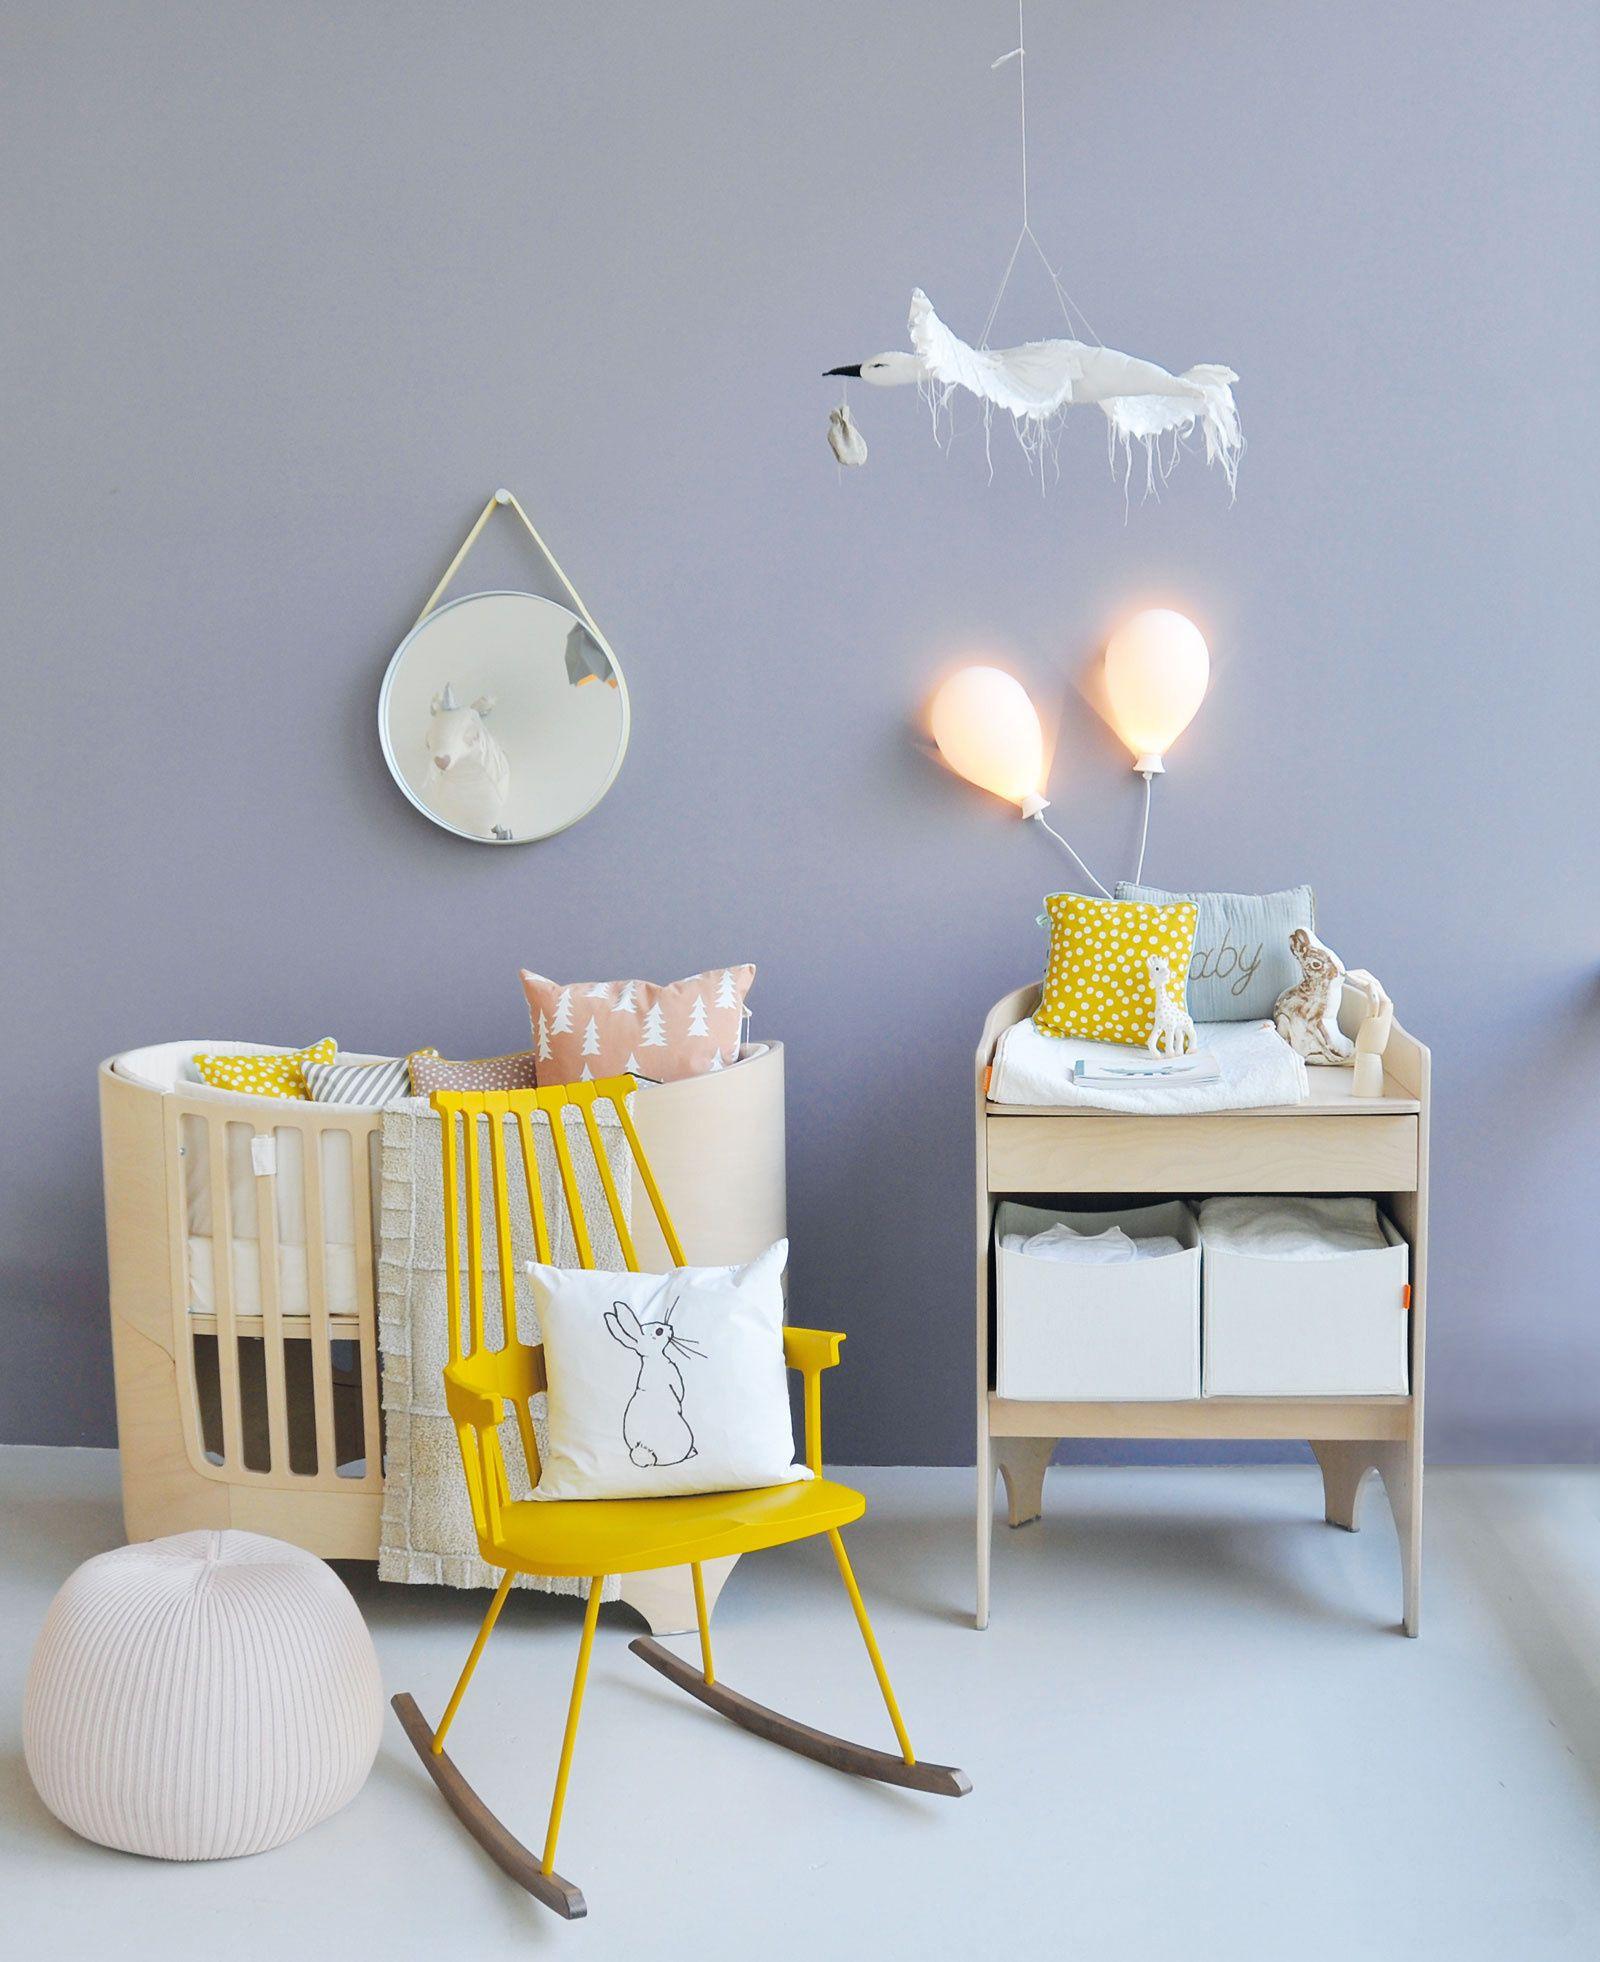 ROOOM Interior Design & Furniture Store for B A B I E S